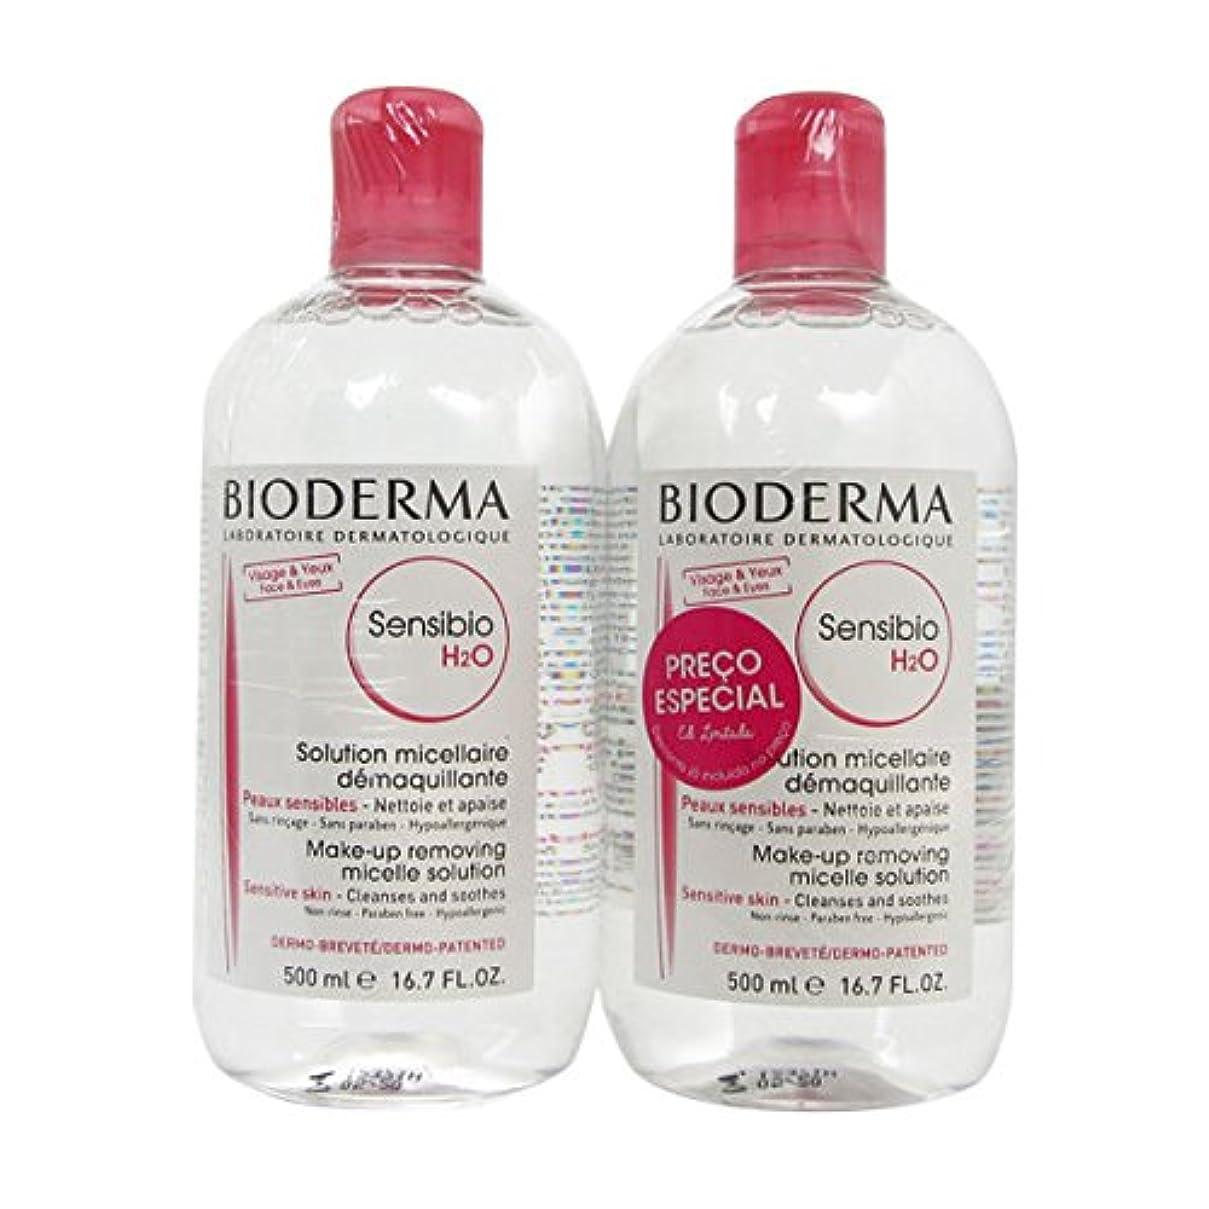 Bioderma Sensibio Pack Crealine H2o Micelle Sollution 2x500ml [並行輸入品]